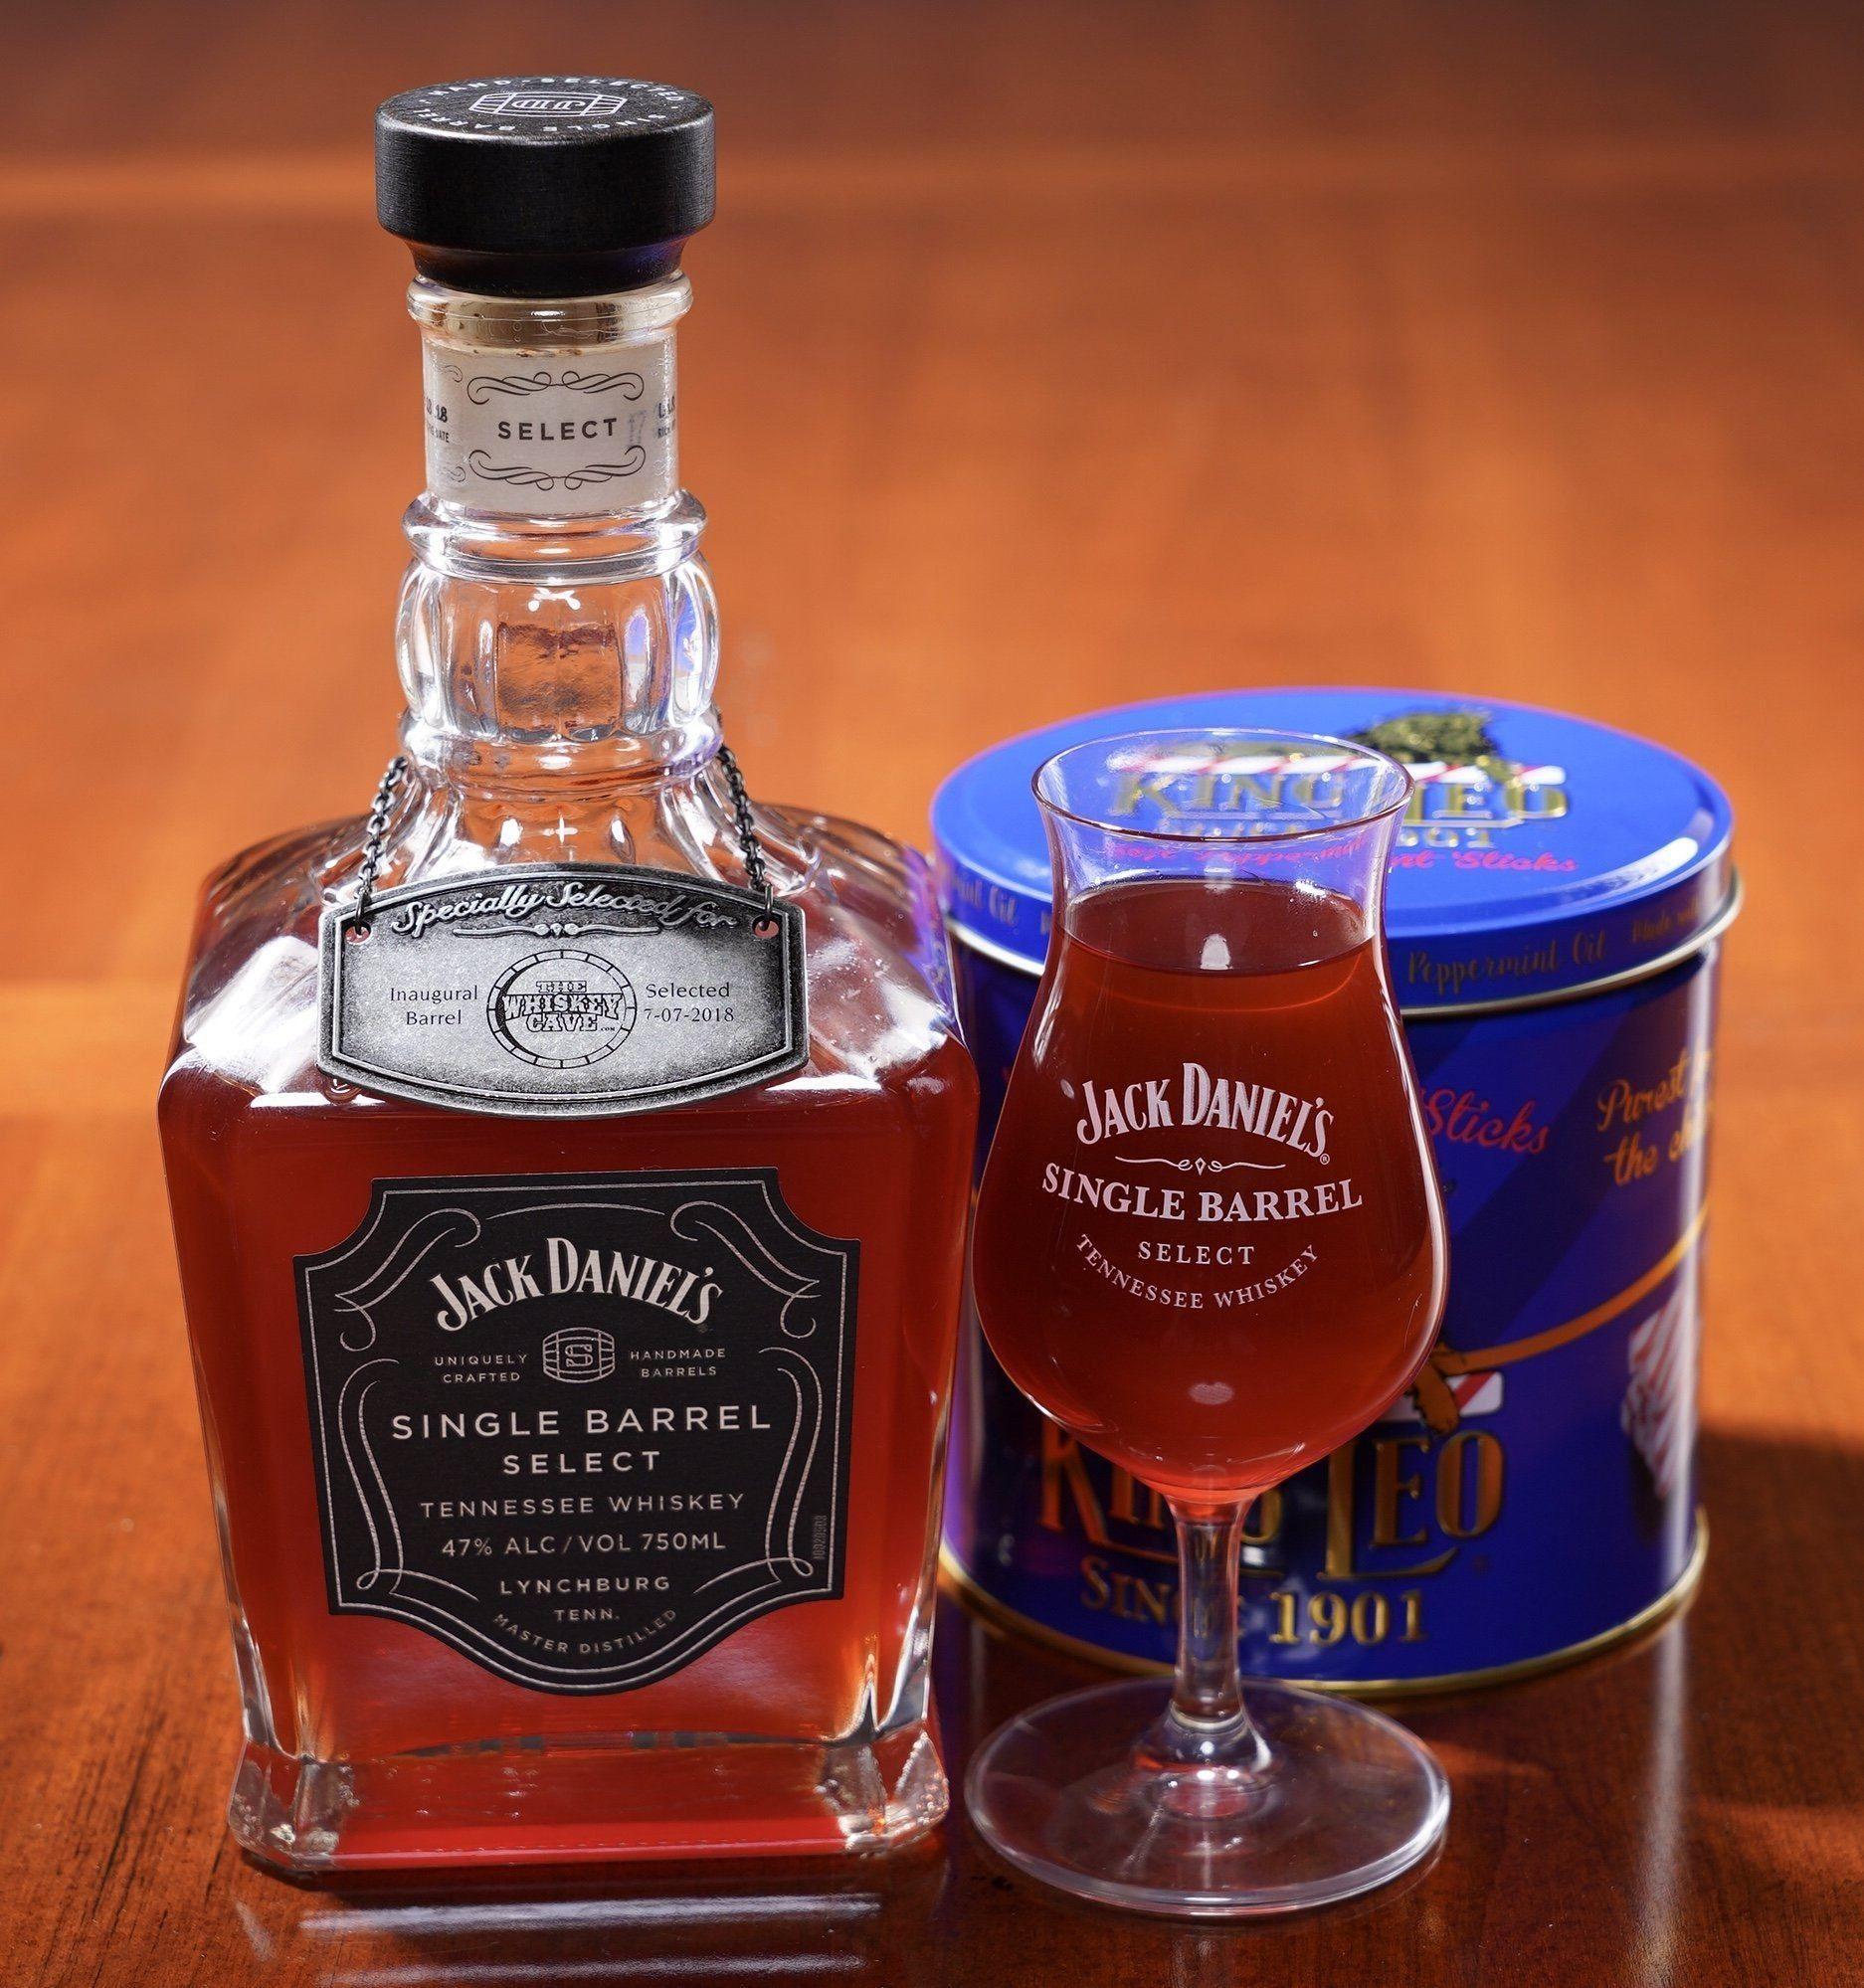 Old No 7 Lynchburg Cough Elixir Jack Daniels Jack Daniel S Tennessee Whiskey Whiskey